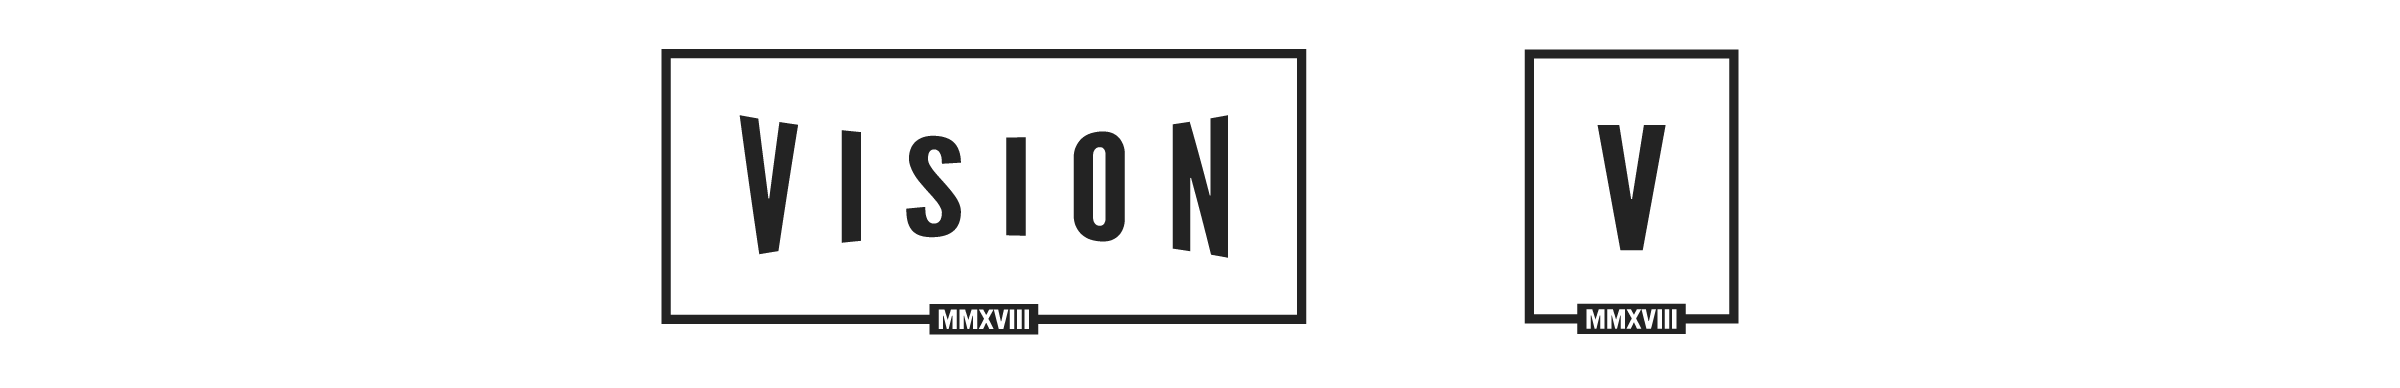 Artboard 3vision.png